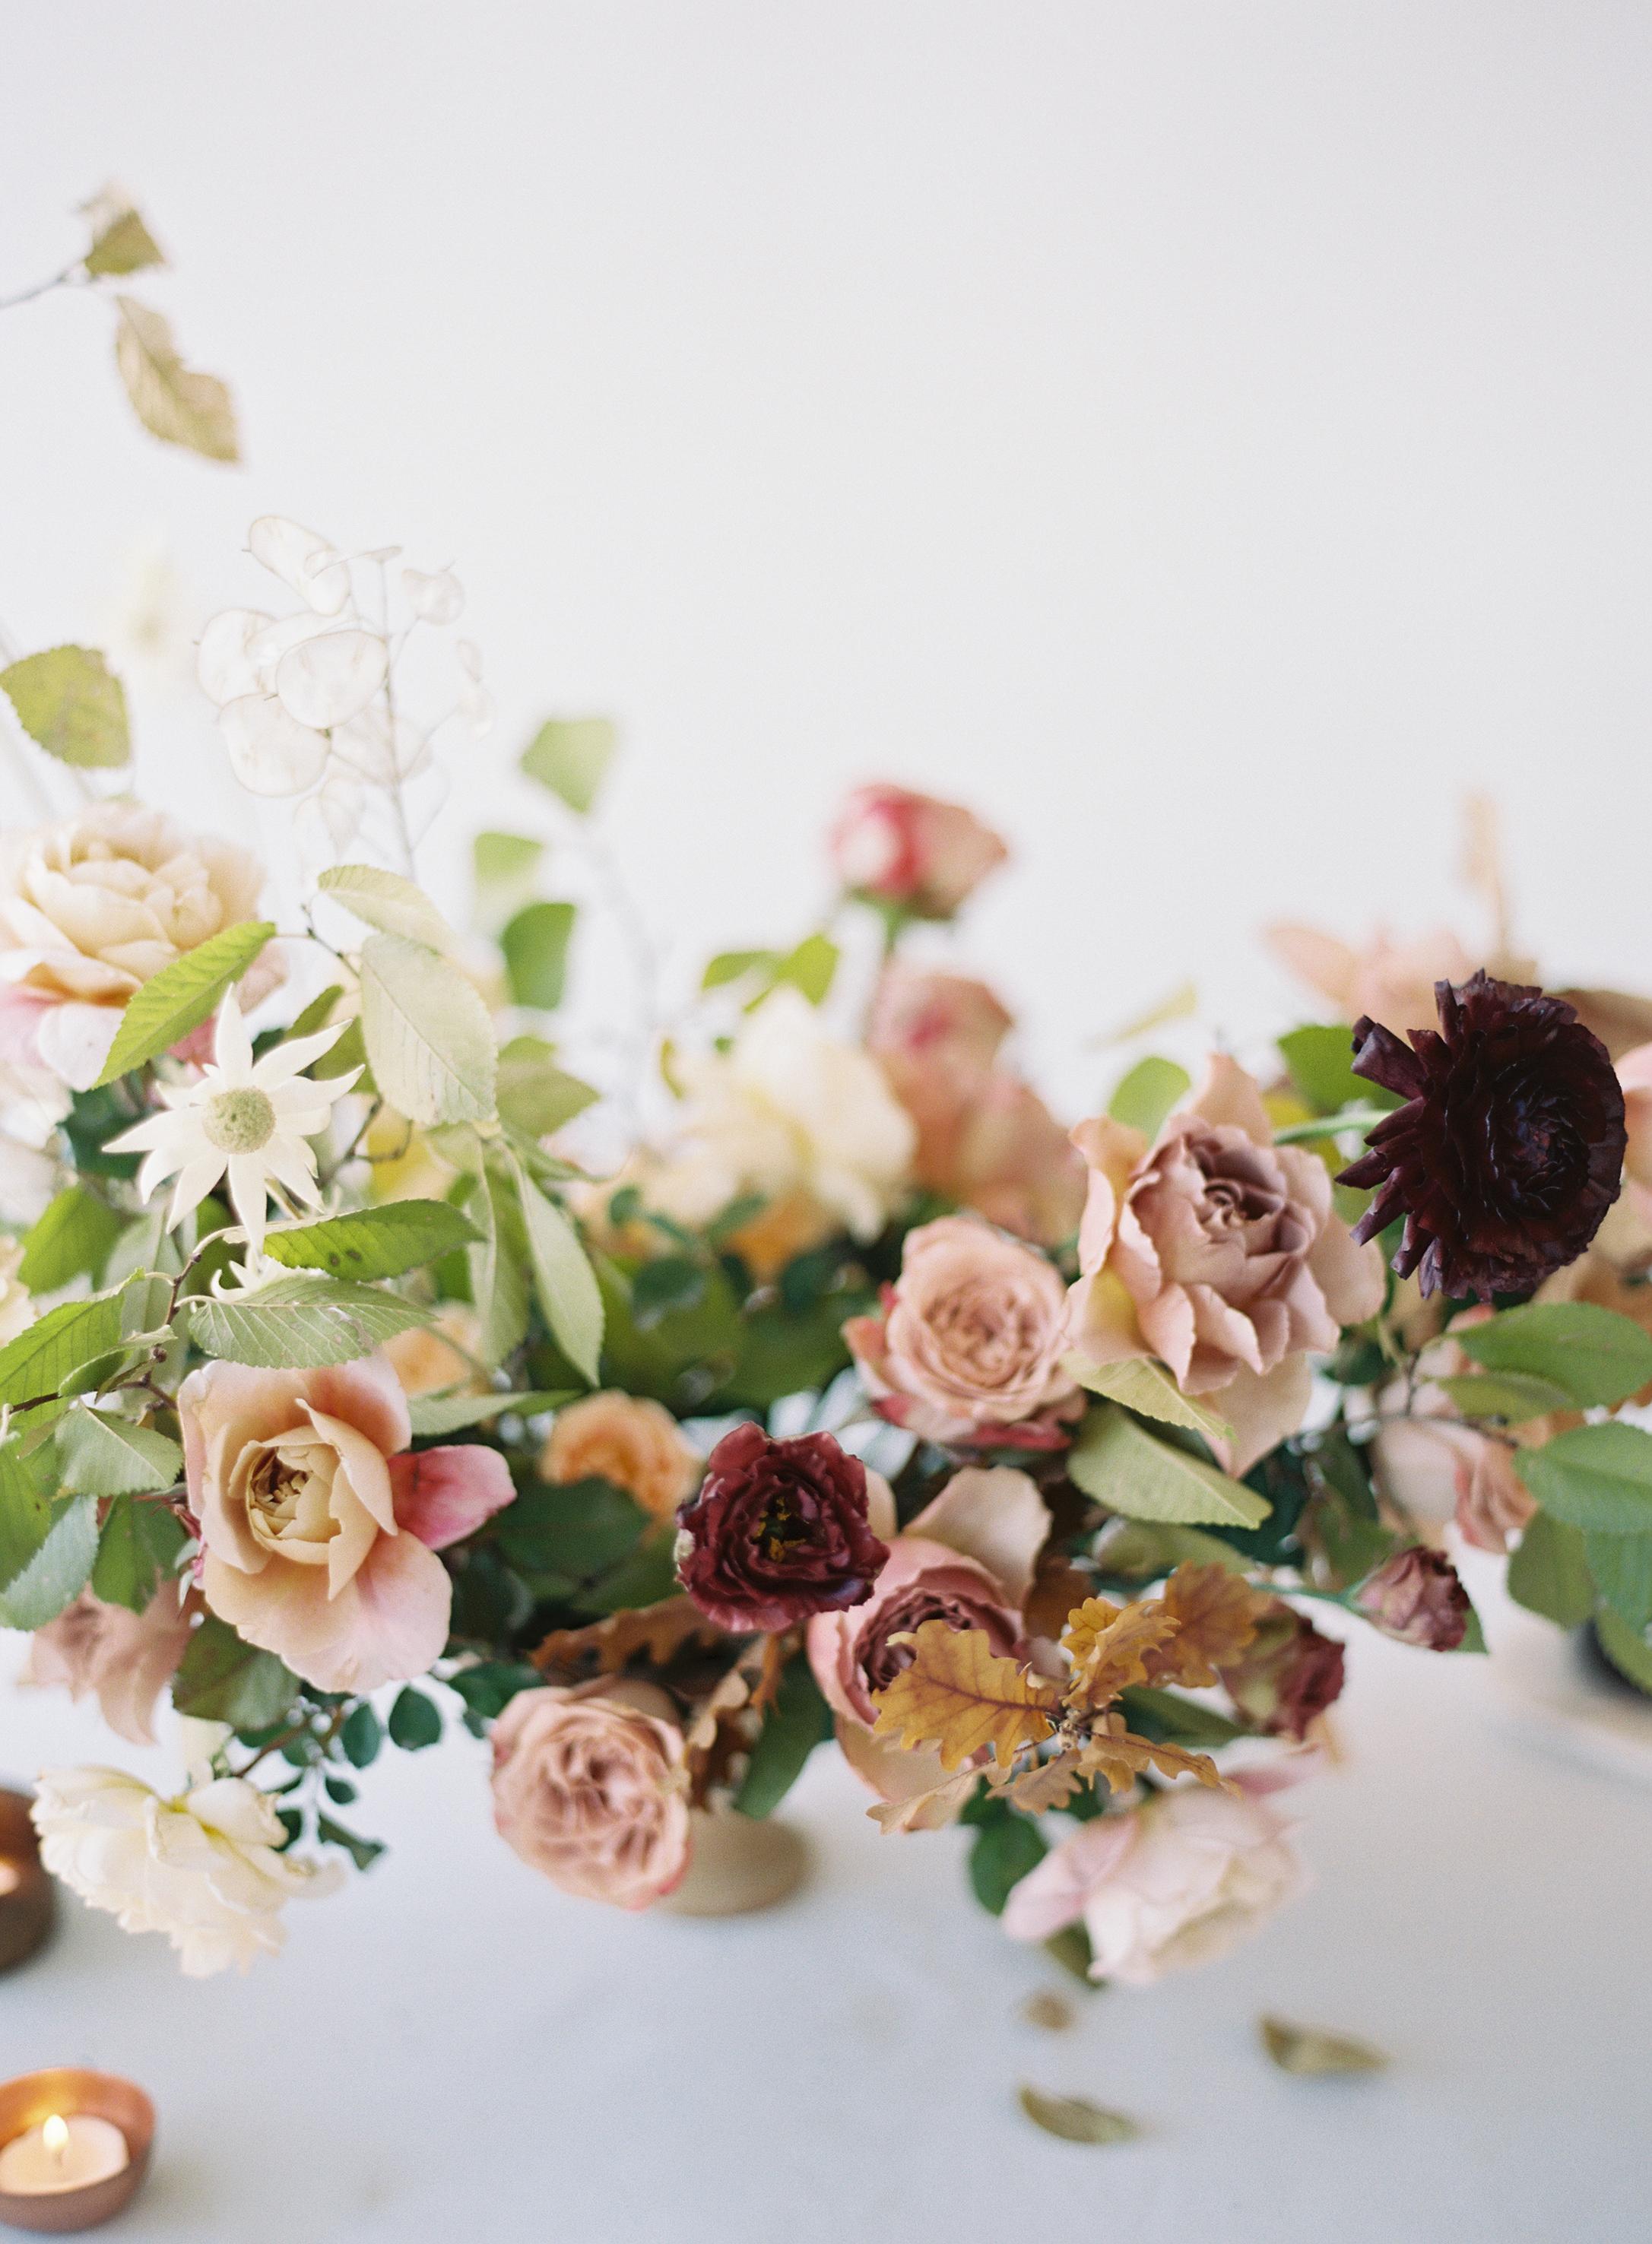 Sentient Floral Workshop-Carrie King Photographer-011.jpg